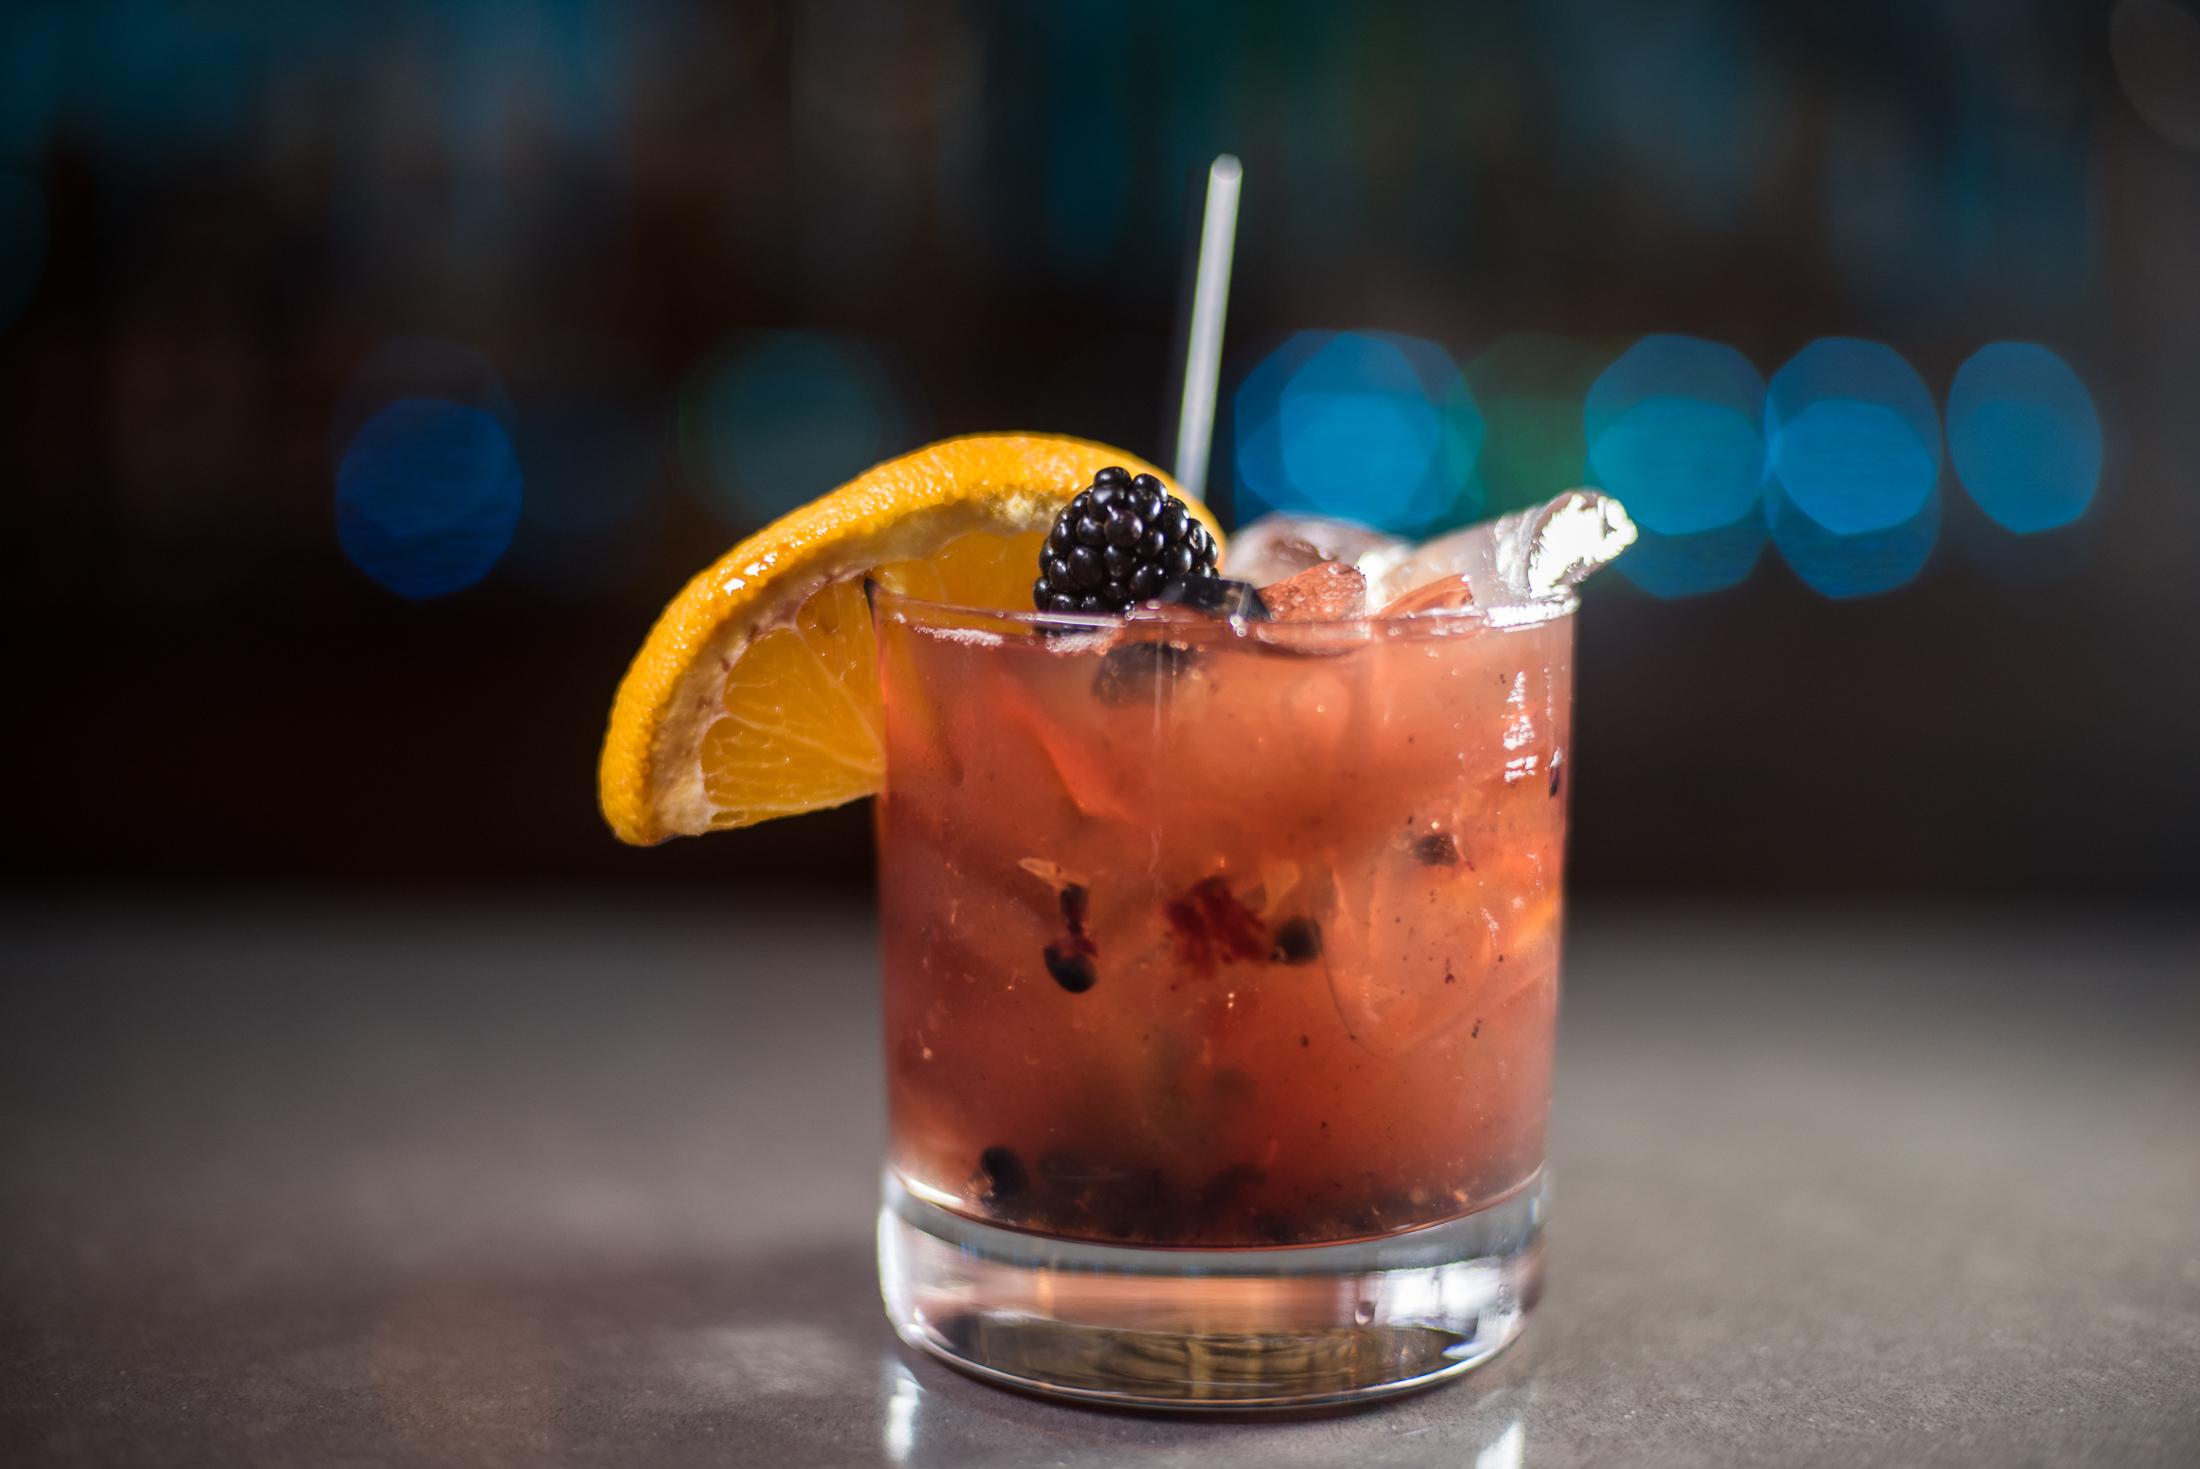 Cran-Old Fashion - Muddled Orange, Cranberries, Luxardo Cherries, Bulleit Bourbon, Bitters$10